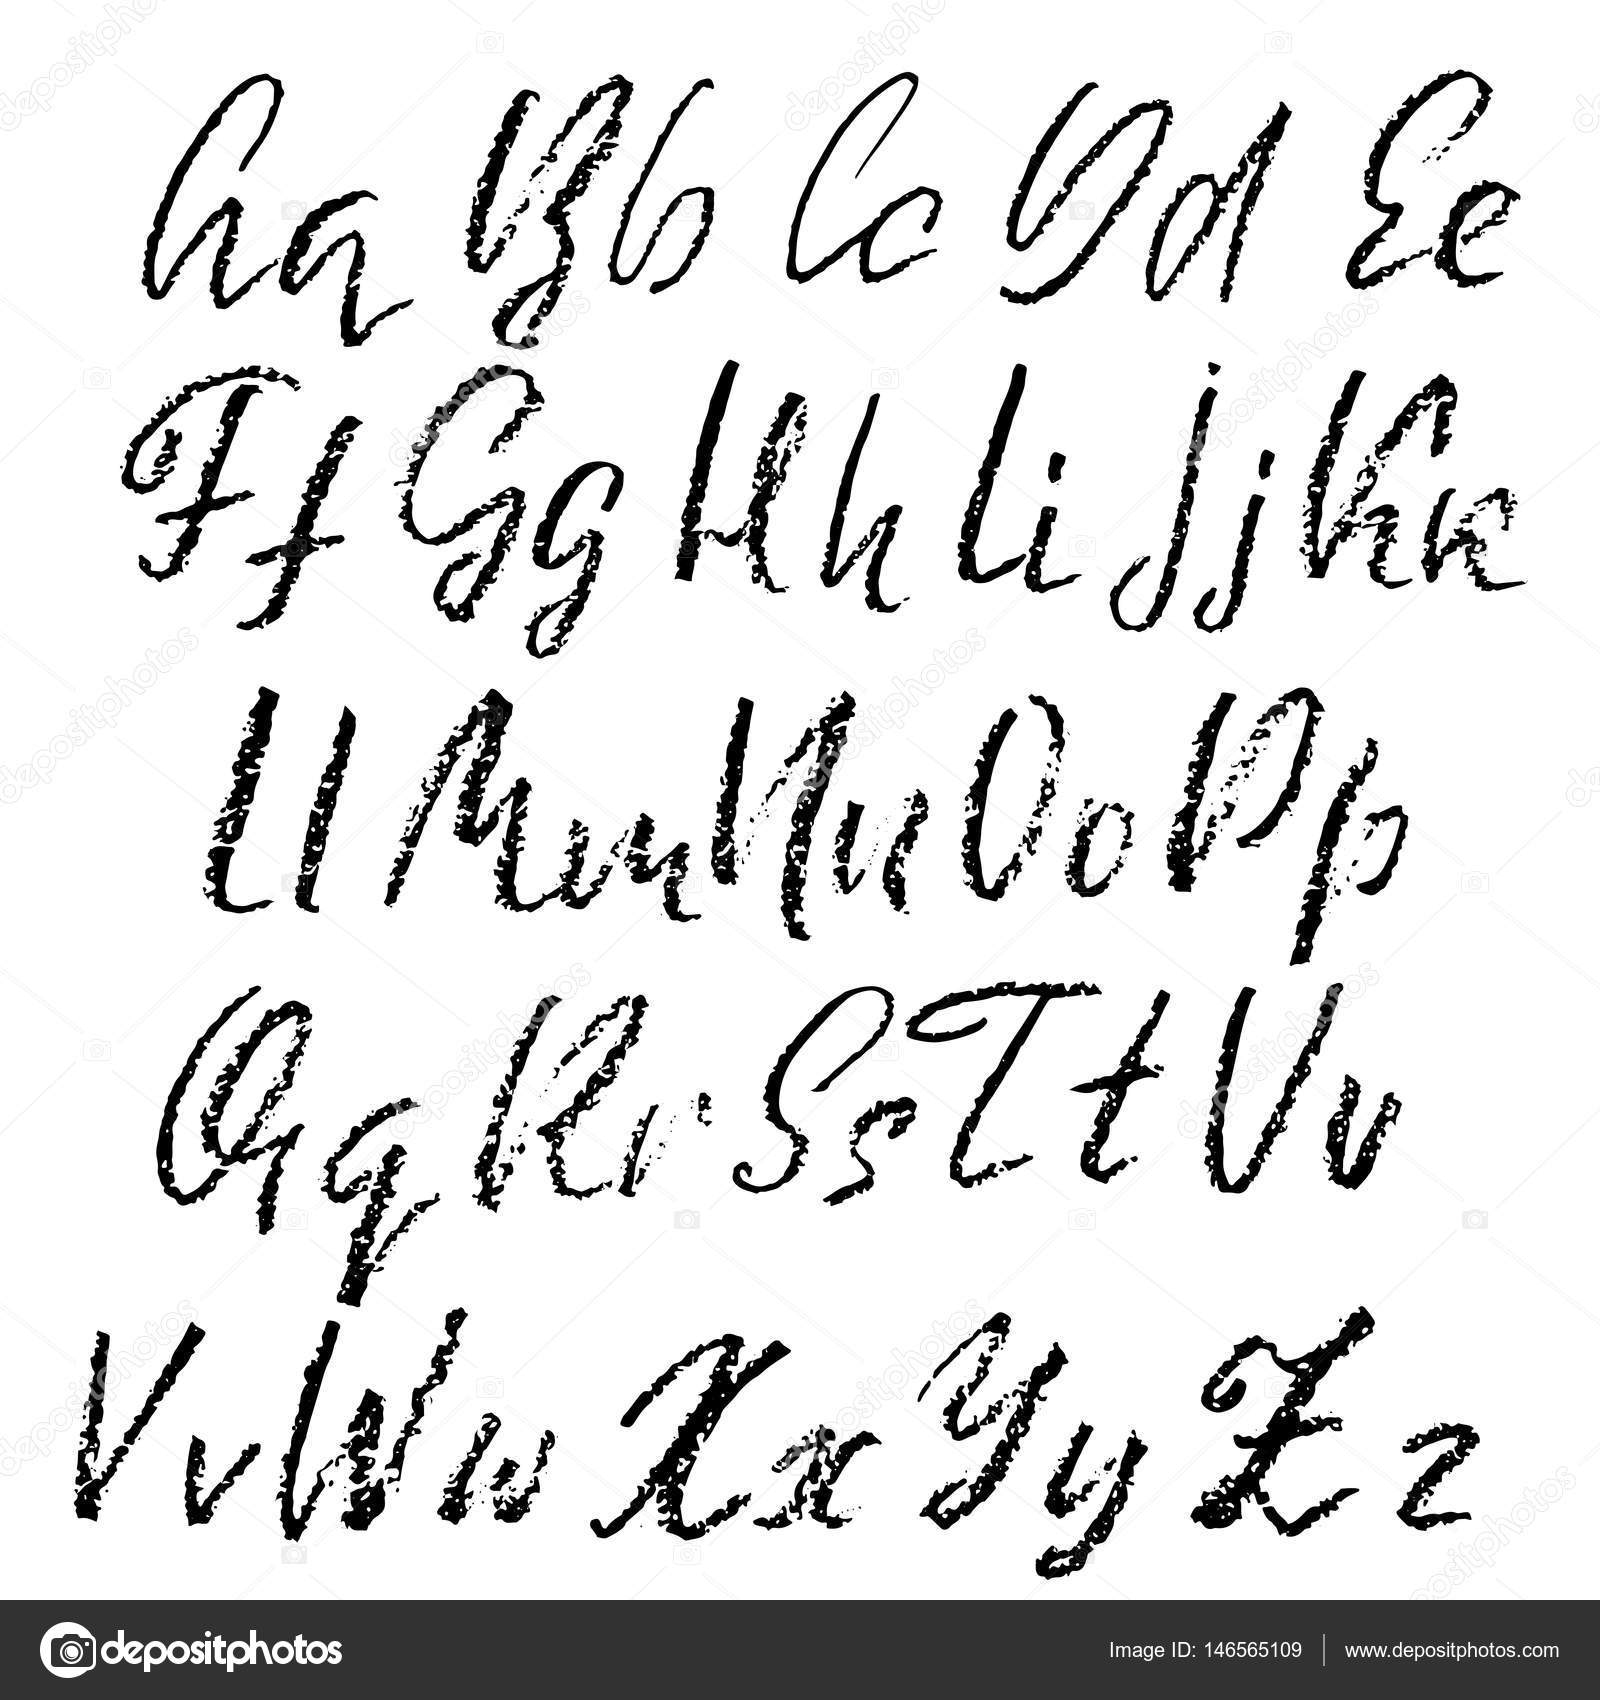 Hand Drawn Font Made By Dry Brush Strokes Grunge Style Modern Alphabet Handwritten